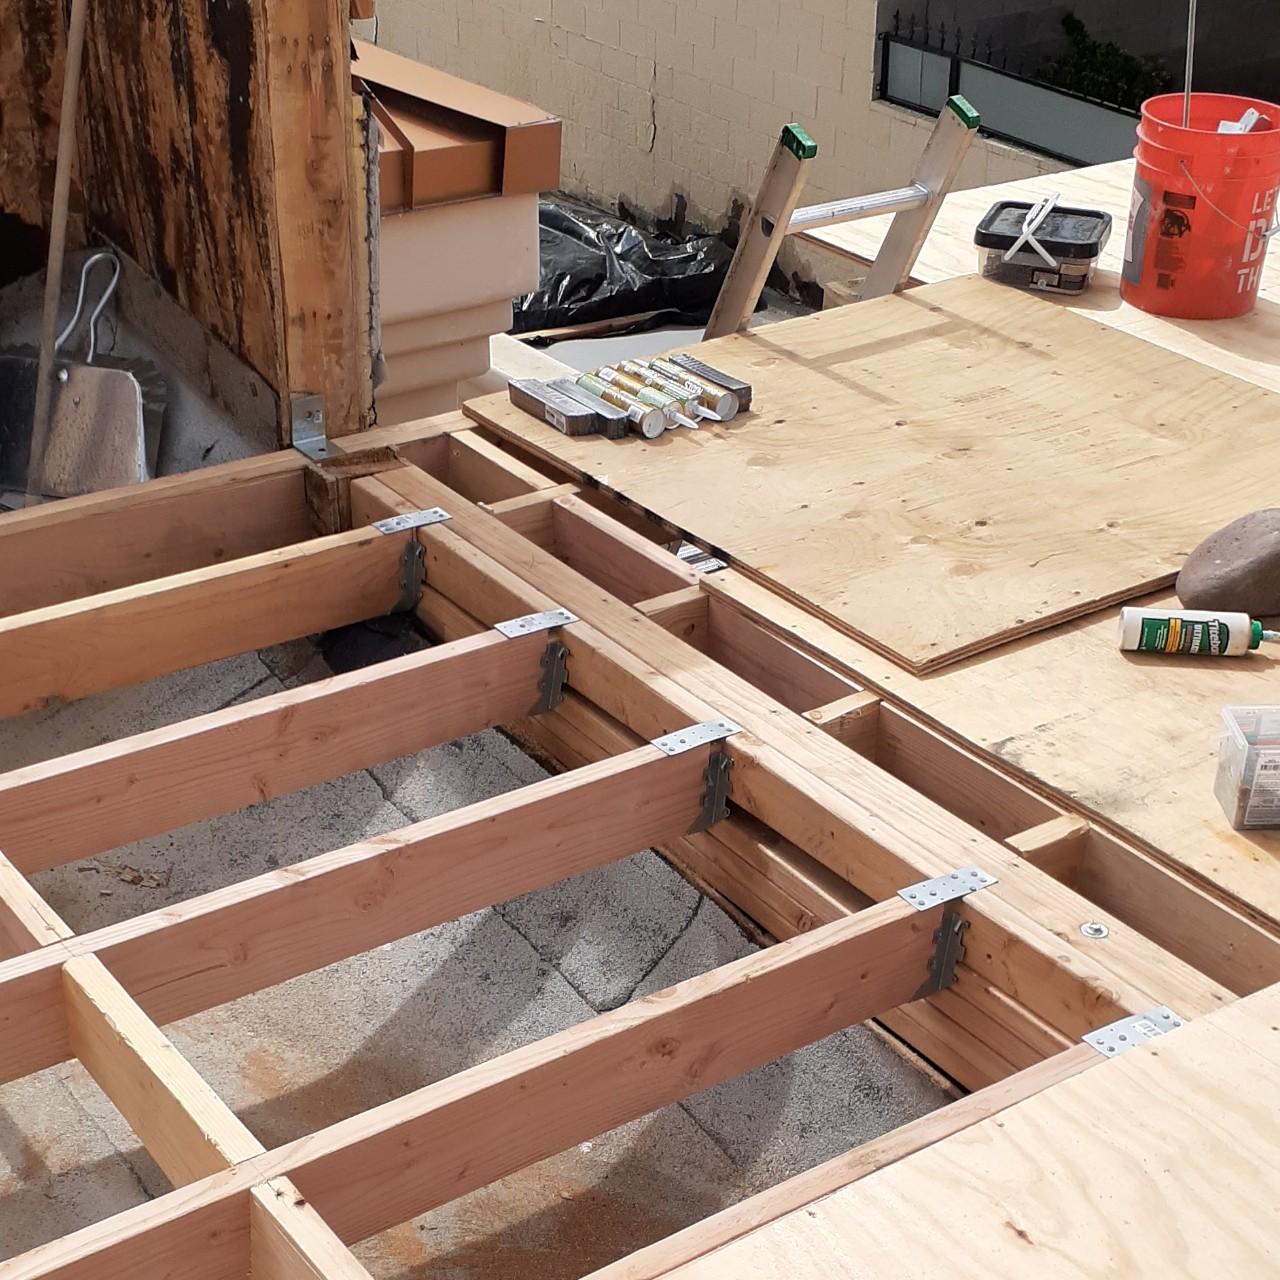 carpentry-wood-framing-second-floor-home-addition--framing-79